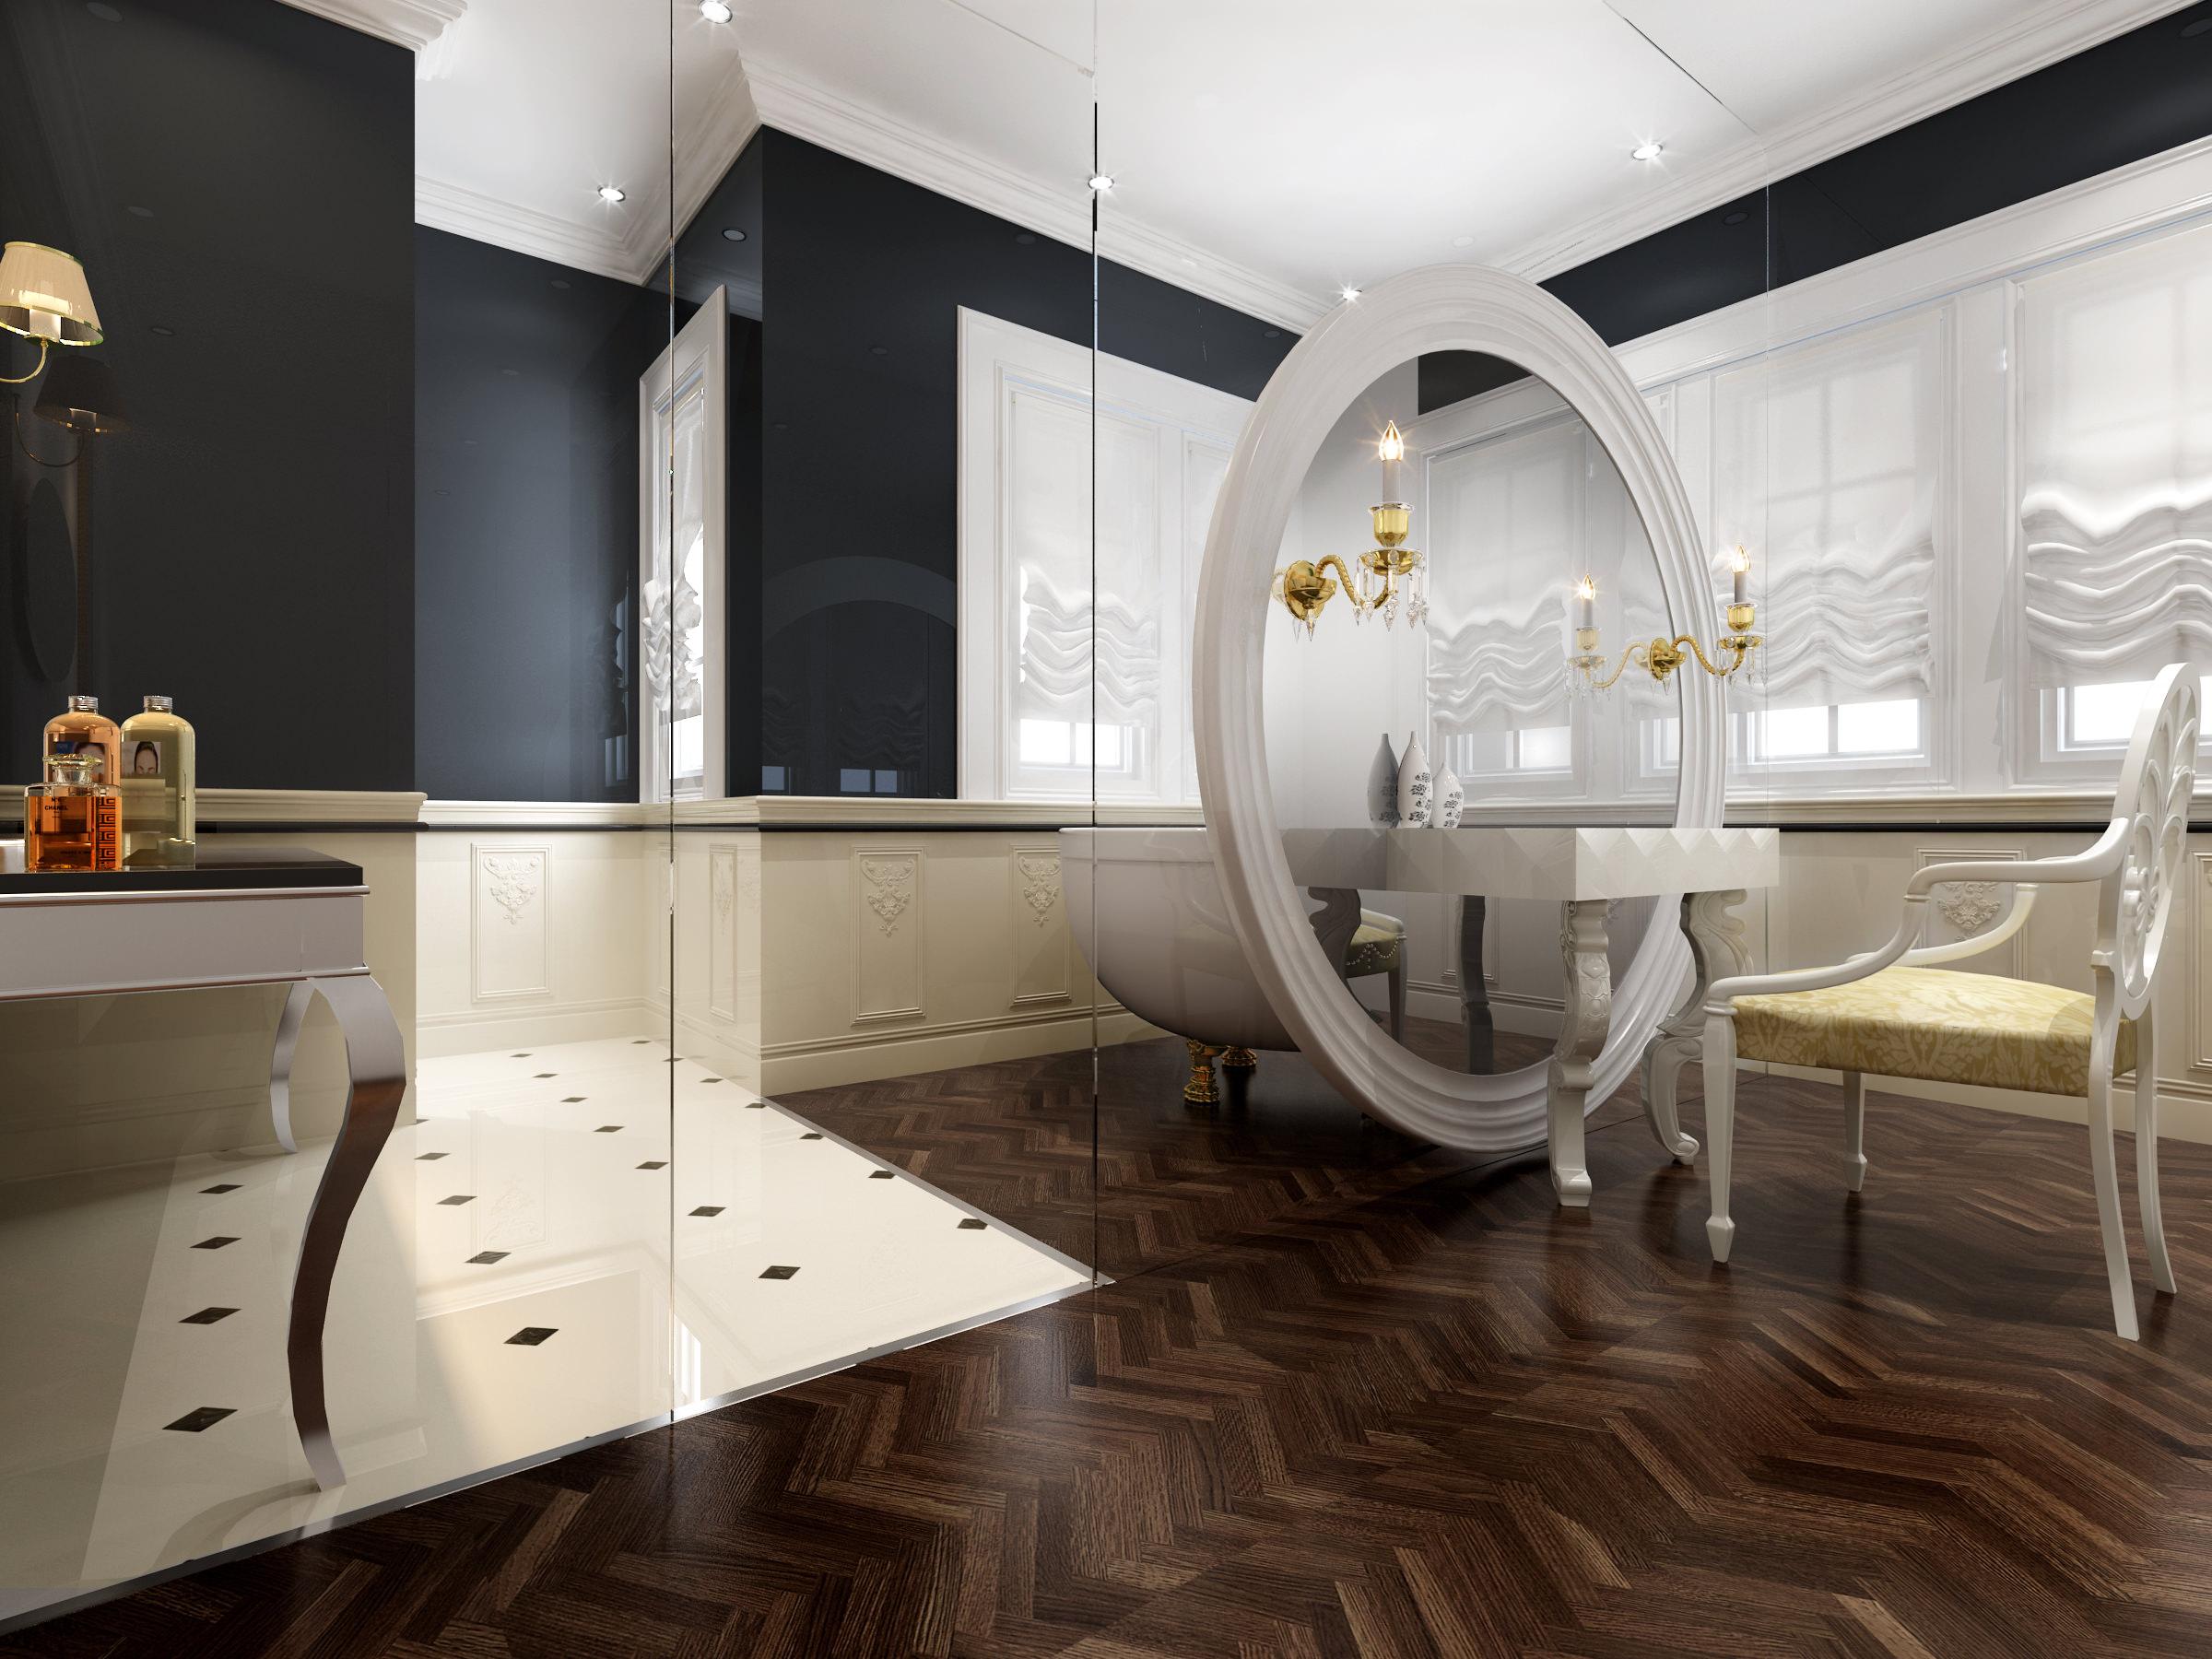 Bathroom Model bathroom with glass decor 3d model max